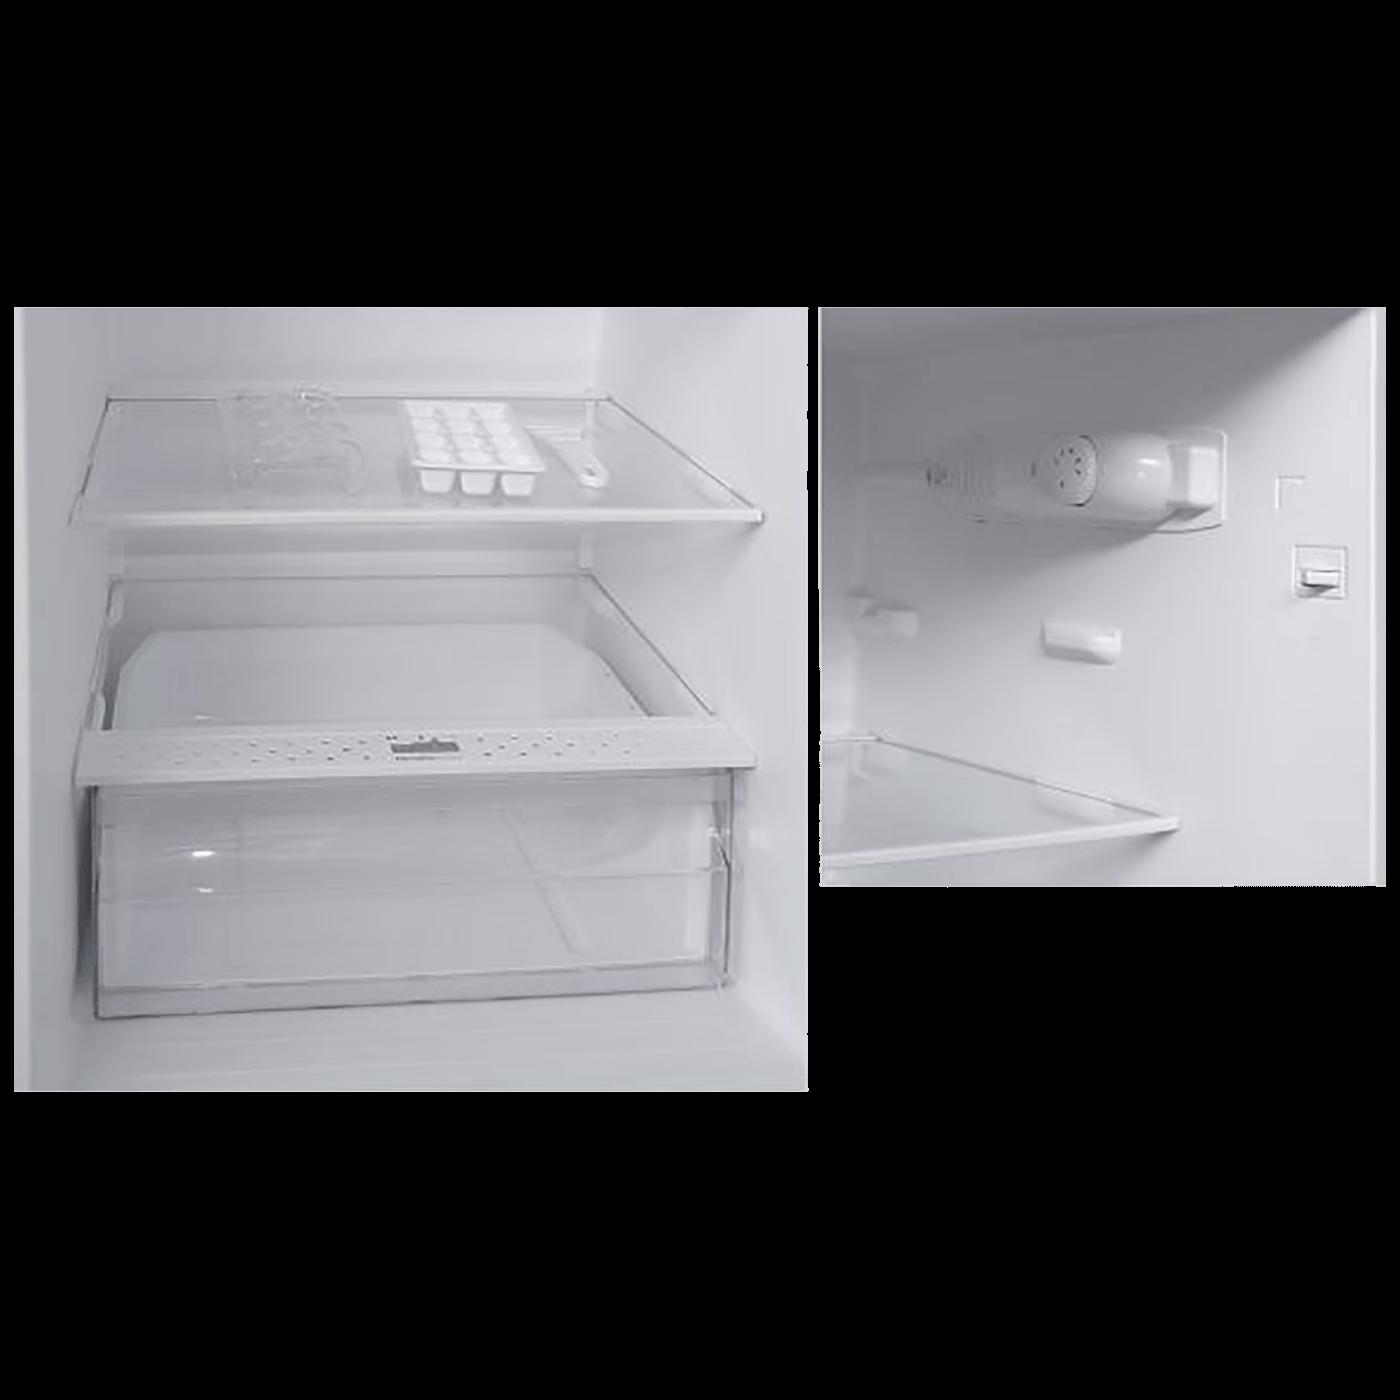 Frižider/zamrzivač, zapremina 270 lit., A+